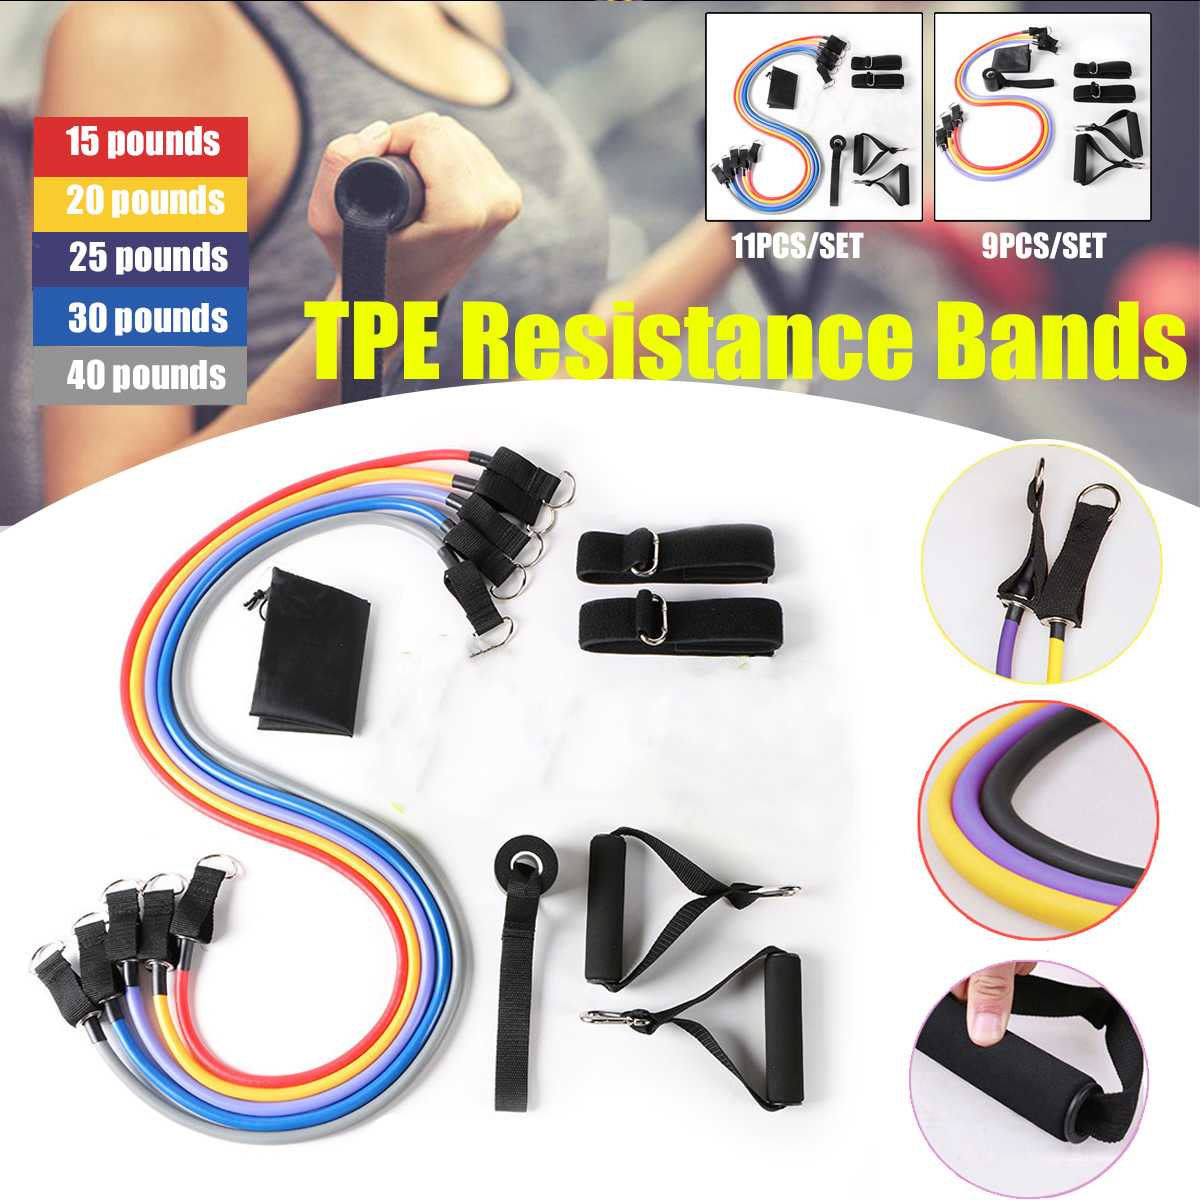 9/11 Pcs Resistance Bands Set Fitness Exercises Resistance Bands Rubber Loop Tube Pedal Workout Yoga Excerciser Training Tools